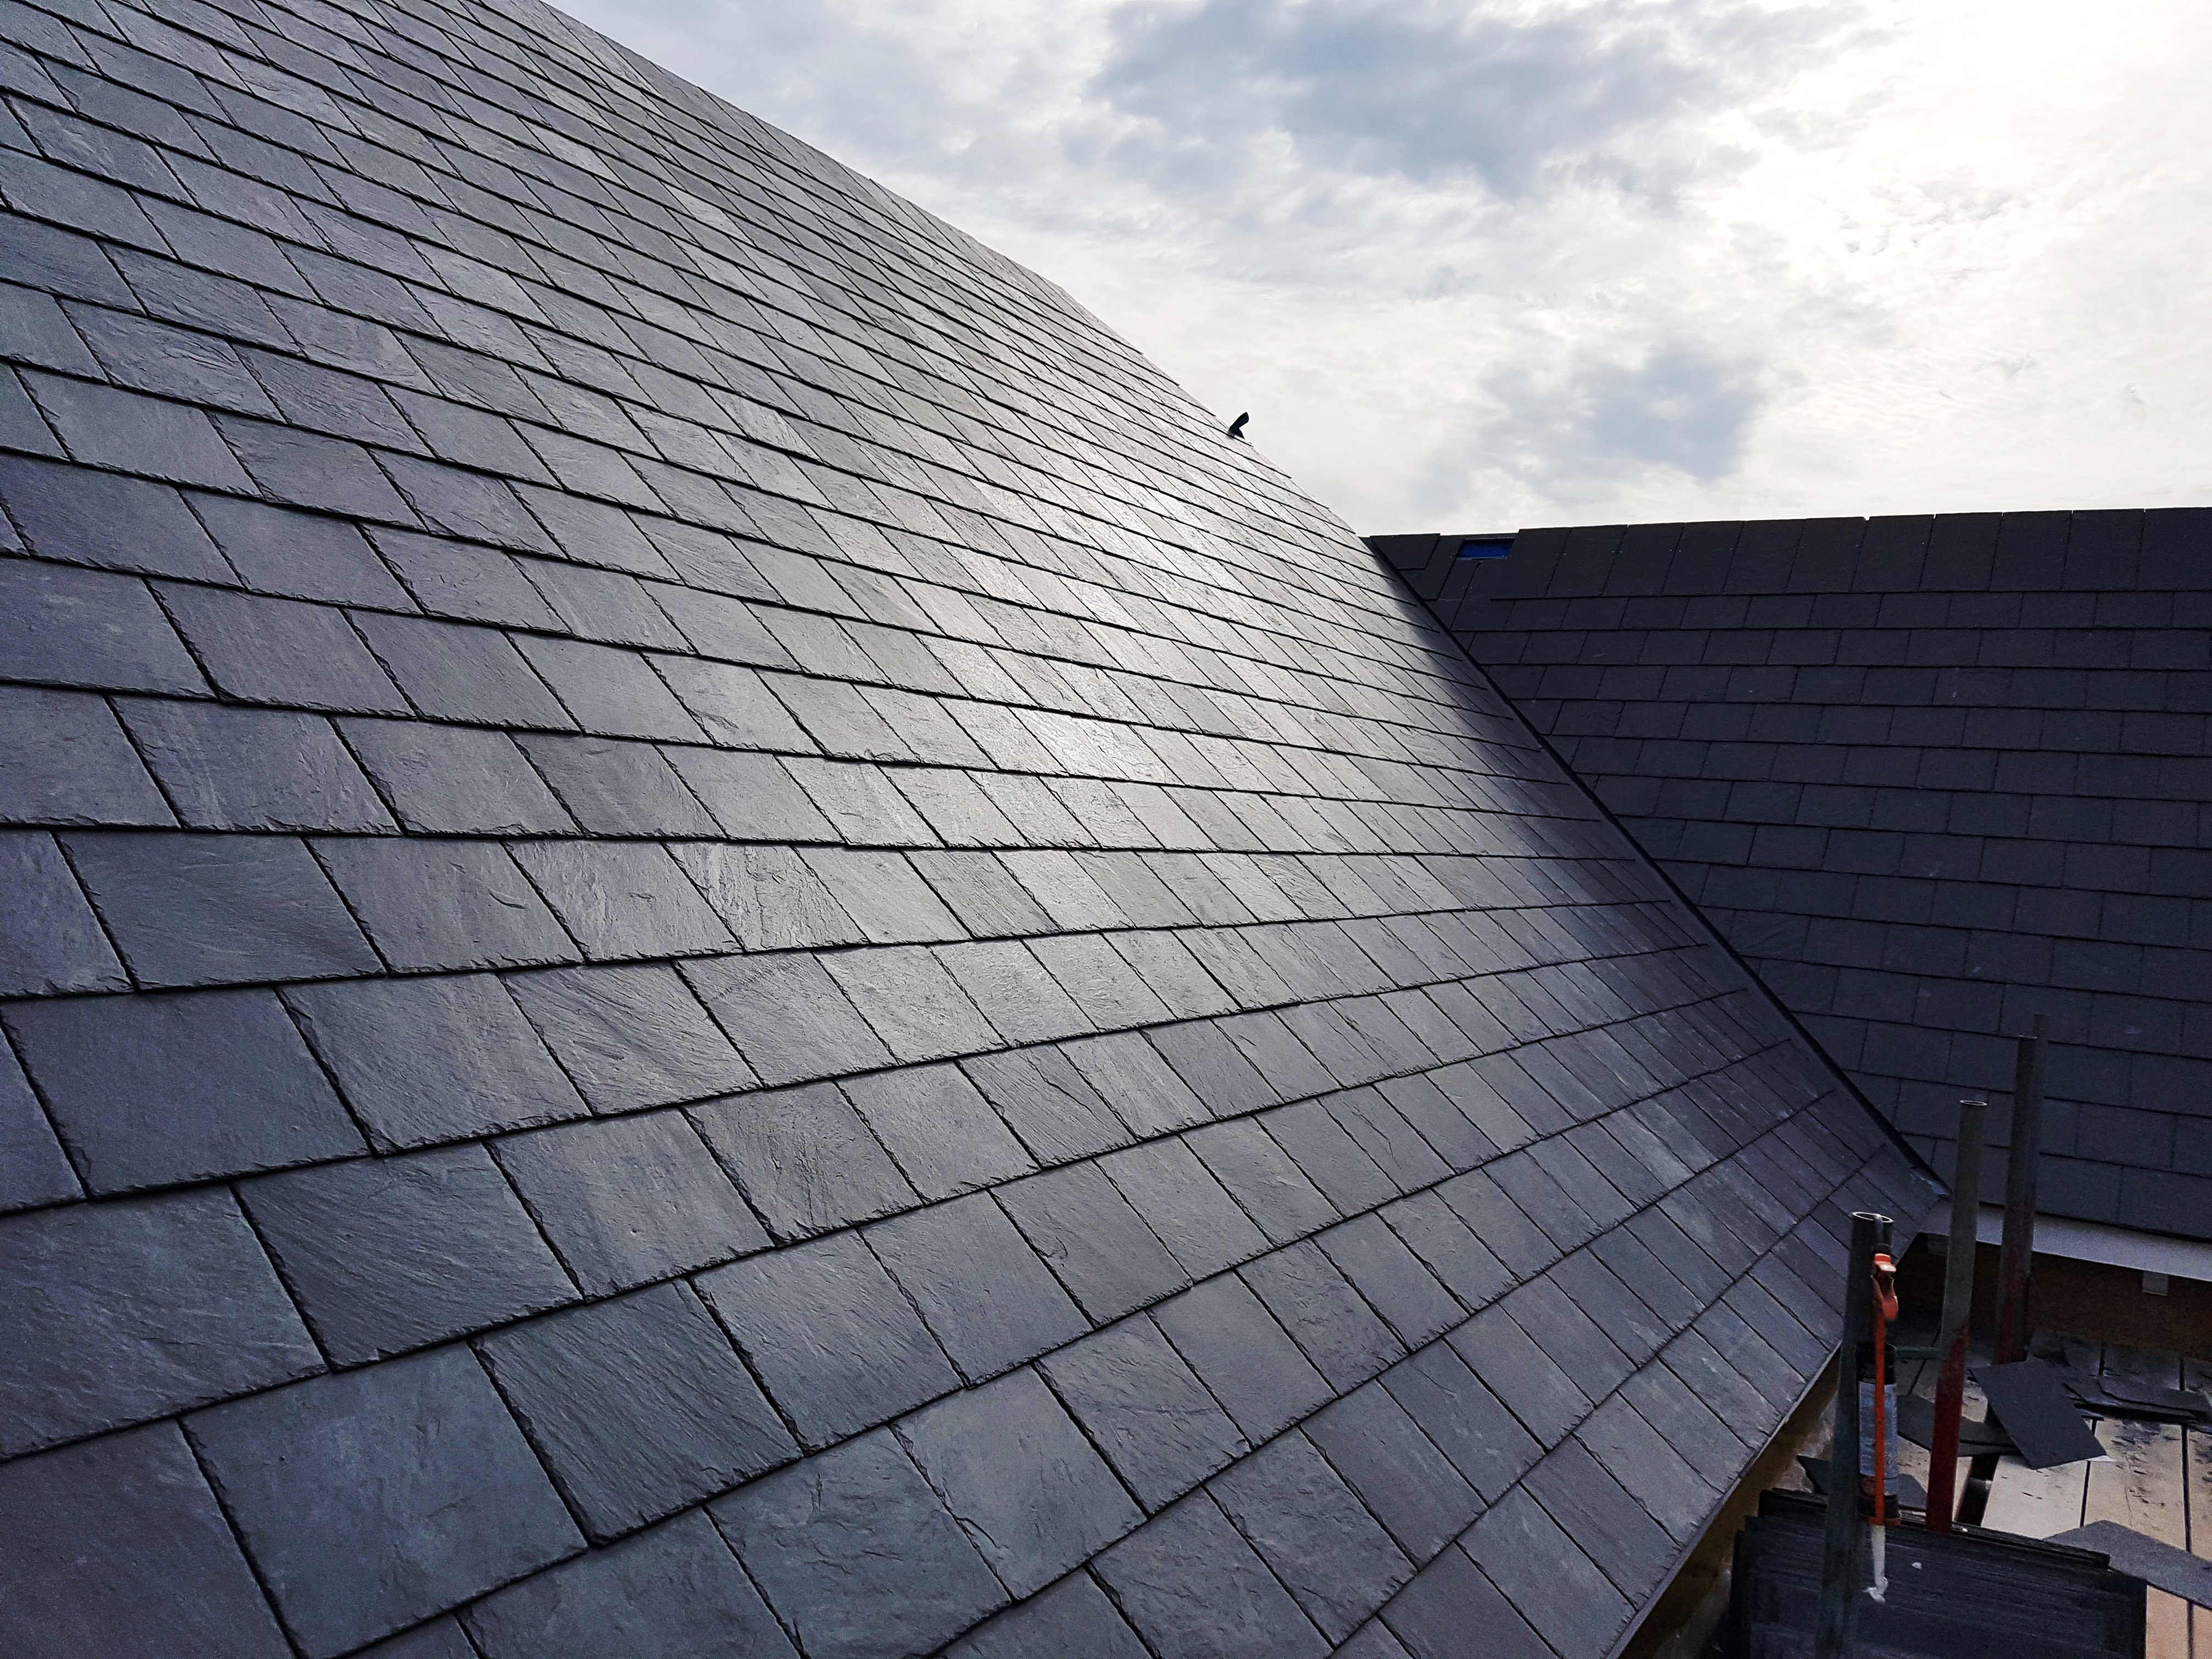 Calidad Premium 60x30 slates on the roof